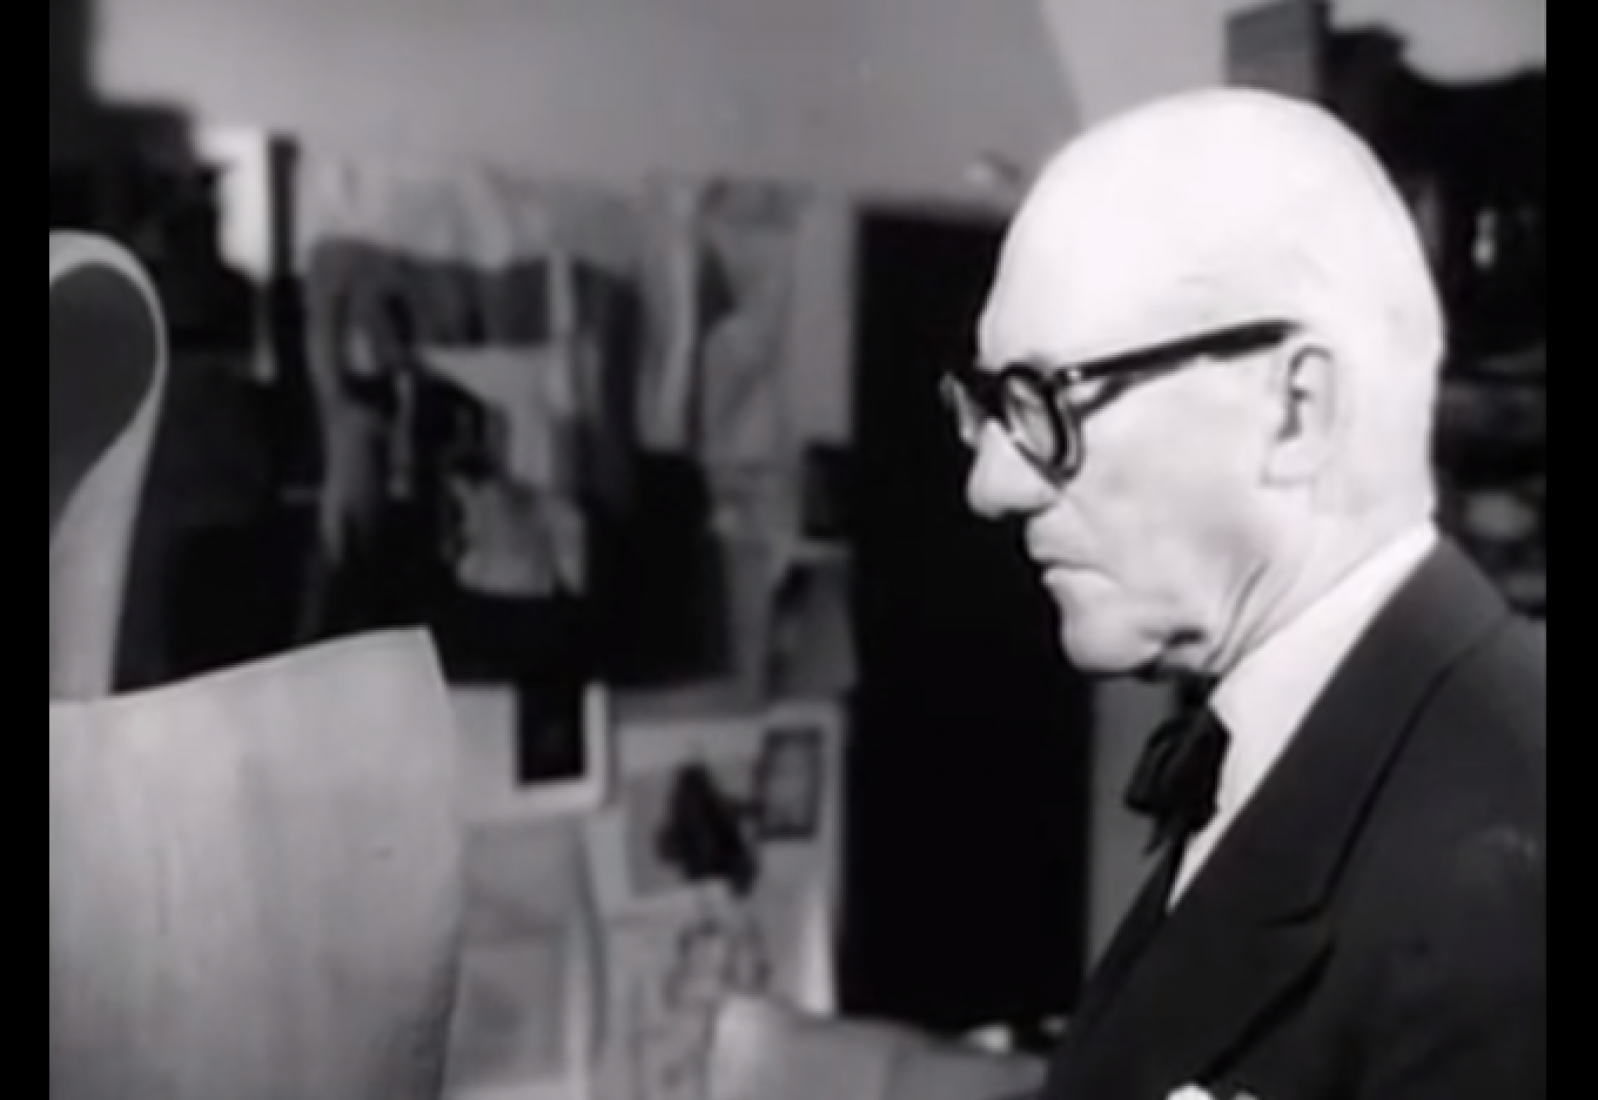 Rare film of Le Corbusier in his Paris home and studio.